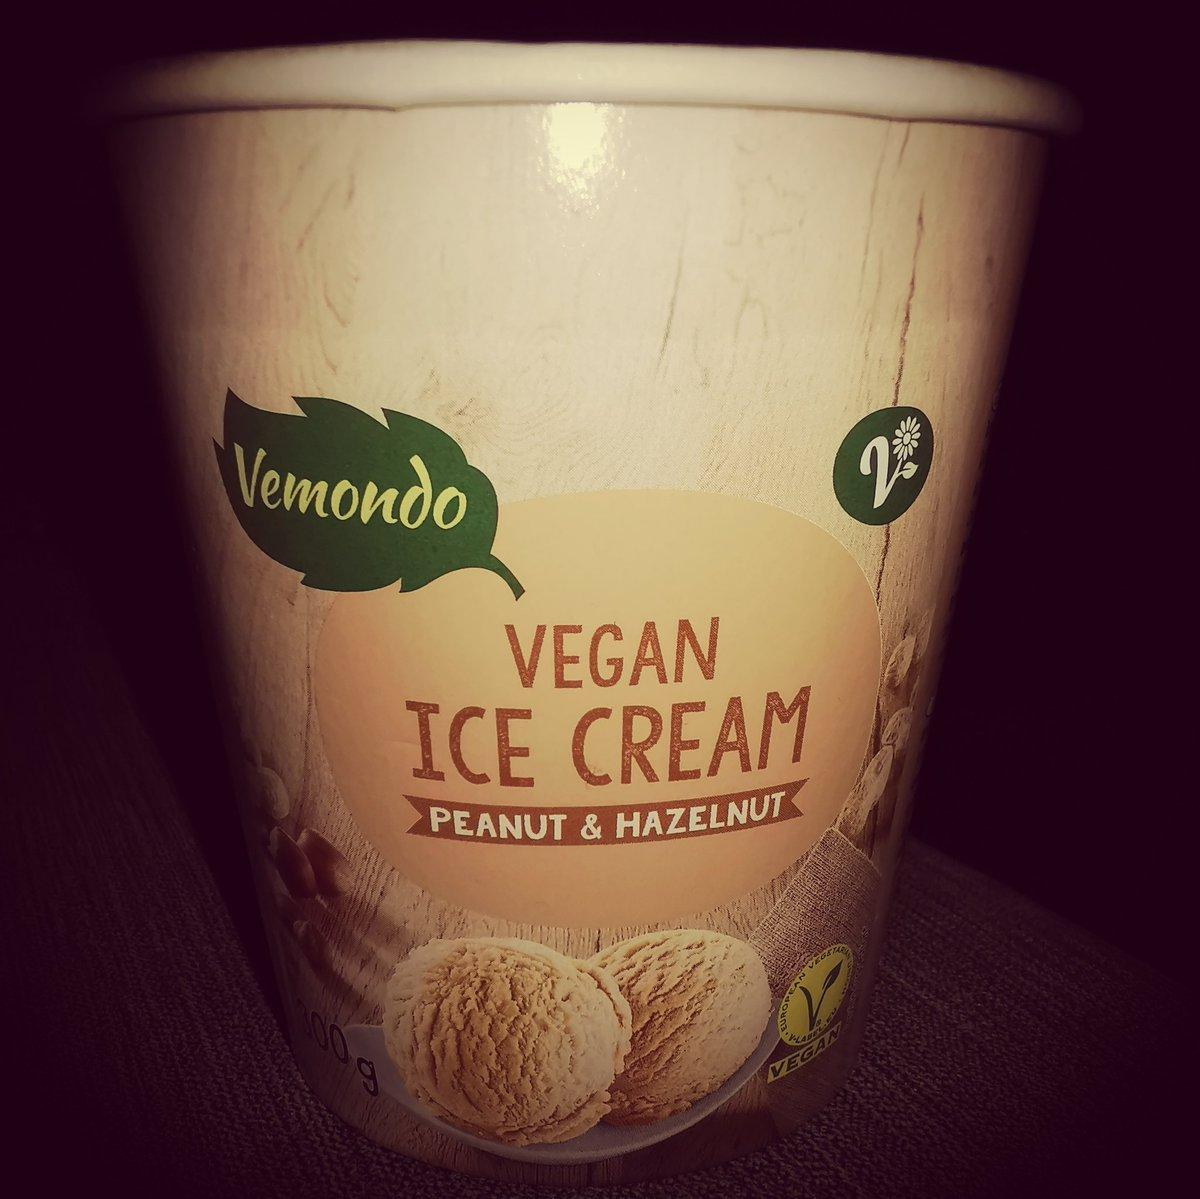 Oooooooppsss ate the whole tub on my own. Bloody delicious though 😋  #SaturdayVibes #Veganuary #SaturdayNight